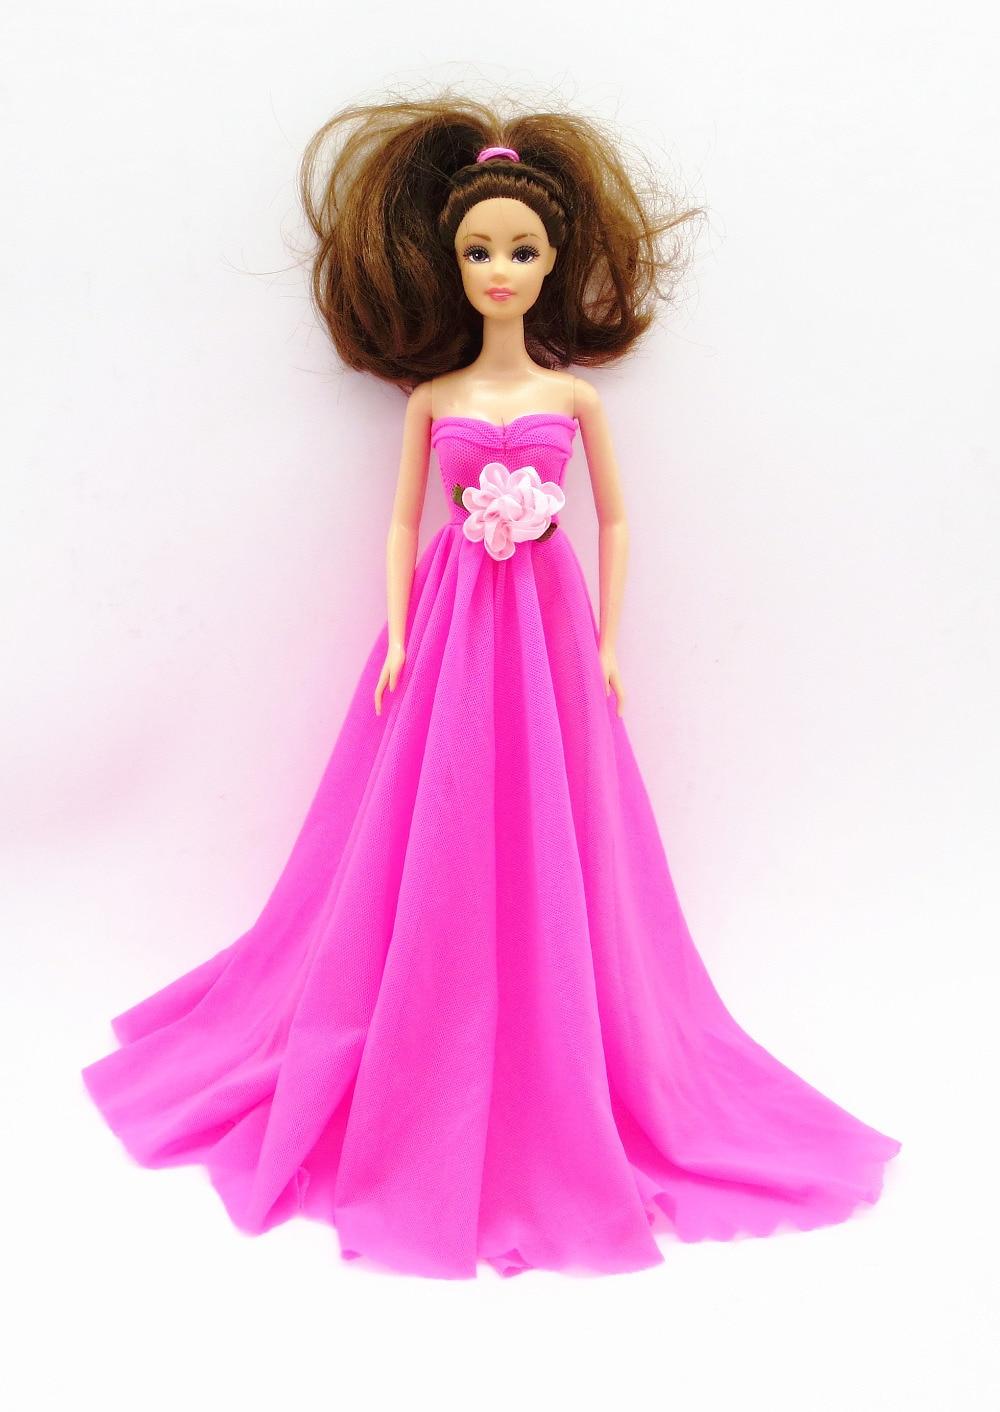 Barbie Doll Dresses | Dress images